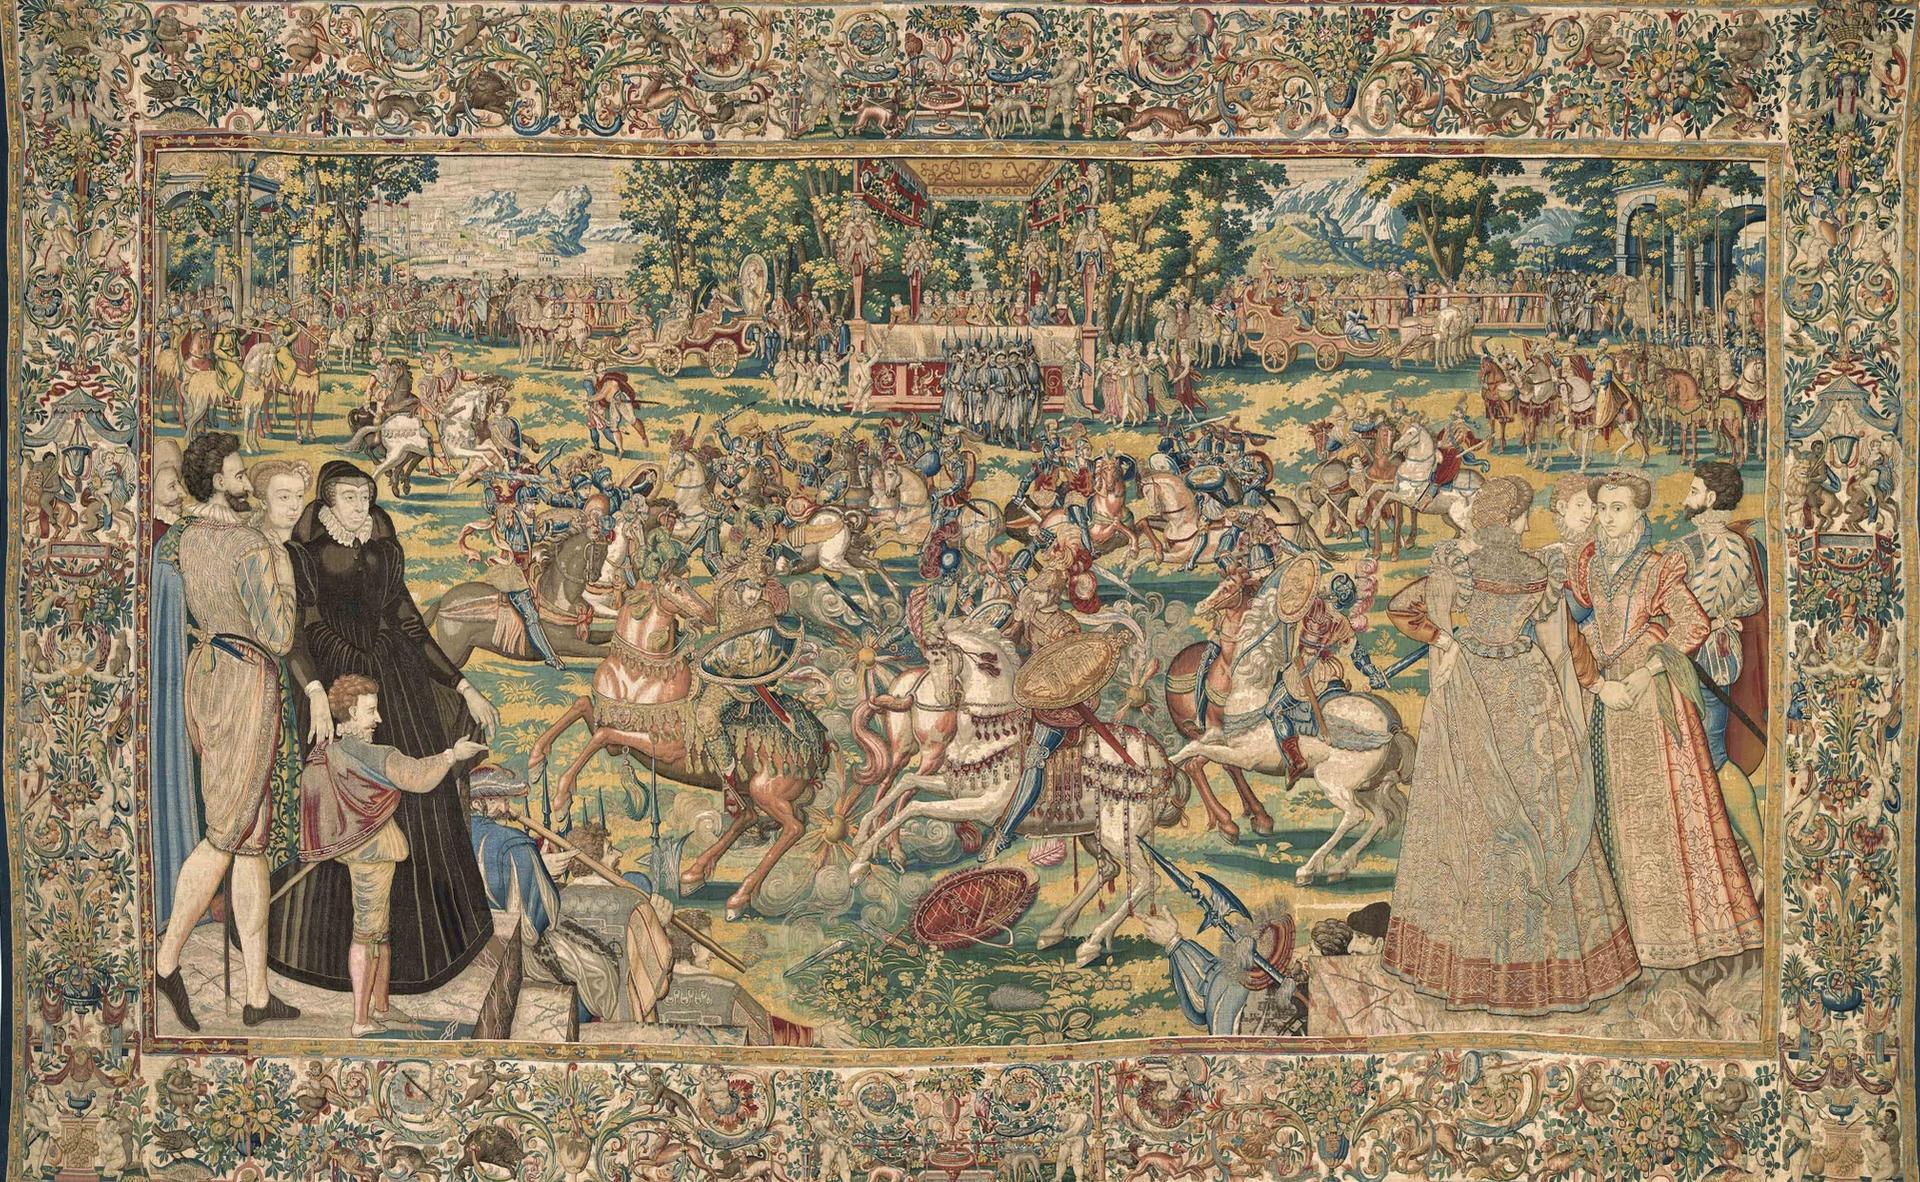 Brussels Master Weaver MGP, Tournament (around 1576) Courtesy of the Gallerie degli Uffizi, Palazzo Pitti. Photo: Roberto Palermo